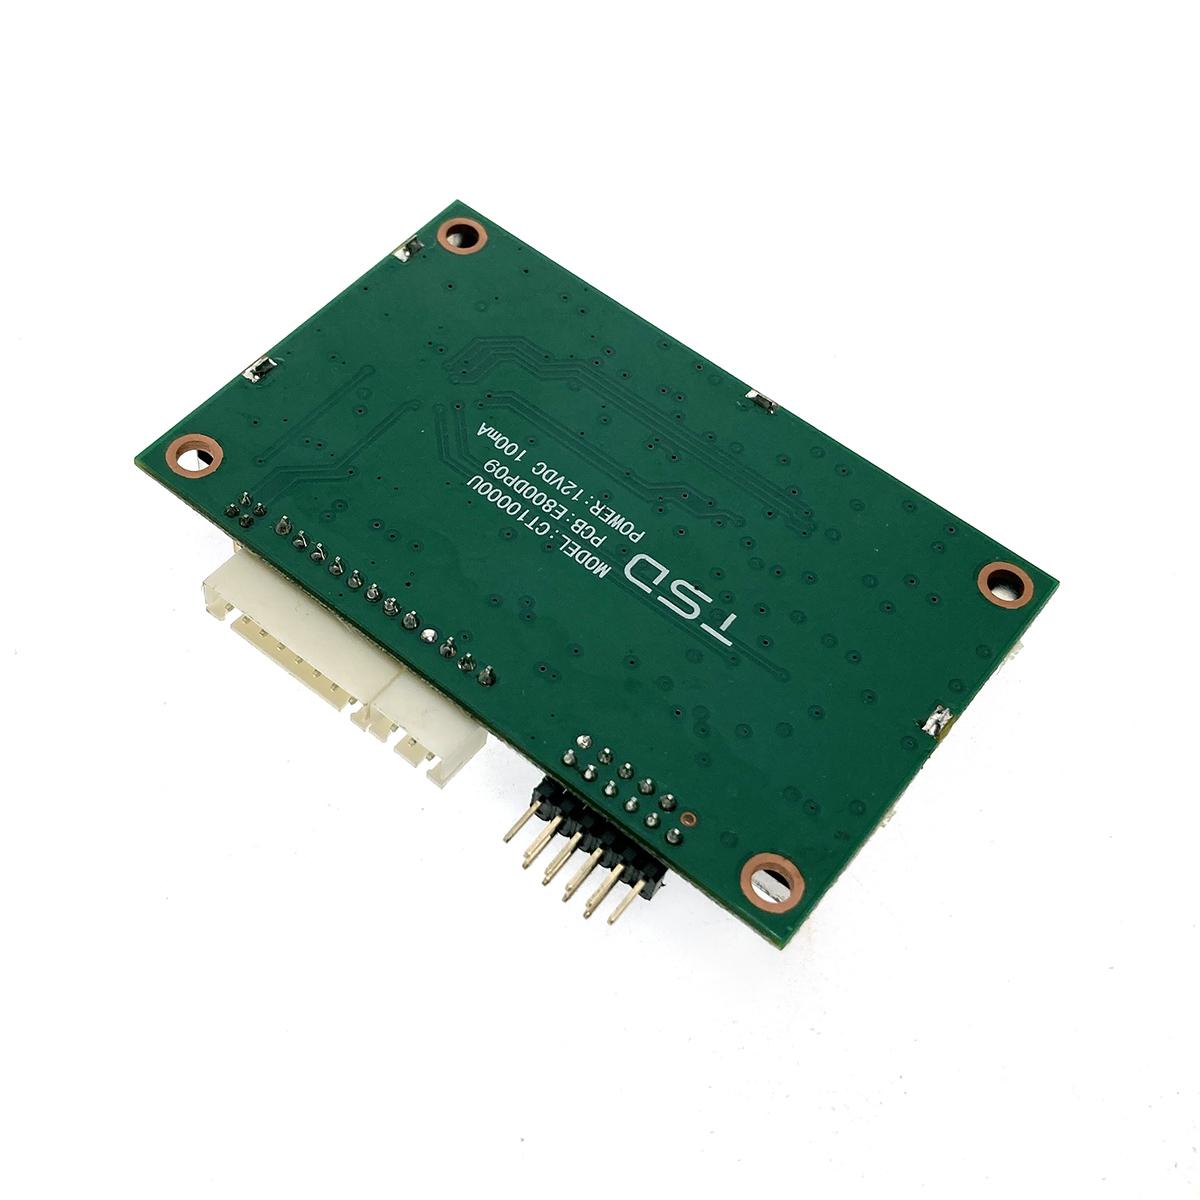 Контроллер FUSB12V для сенсорного экрана Espada F17SAW6